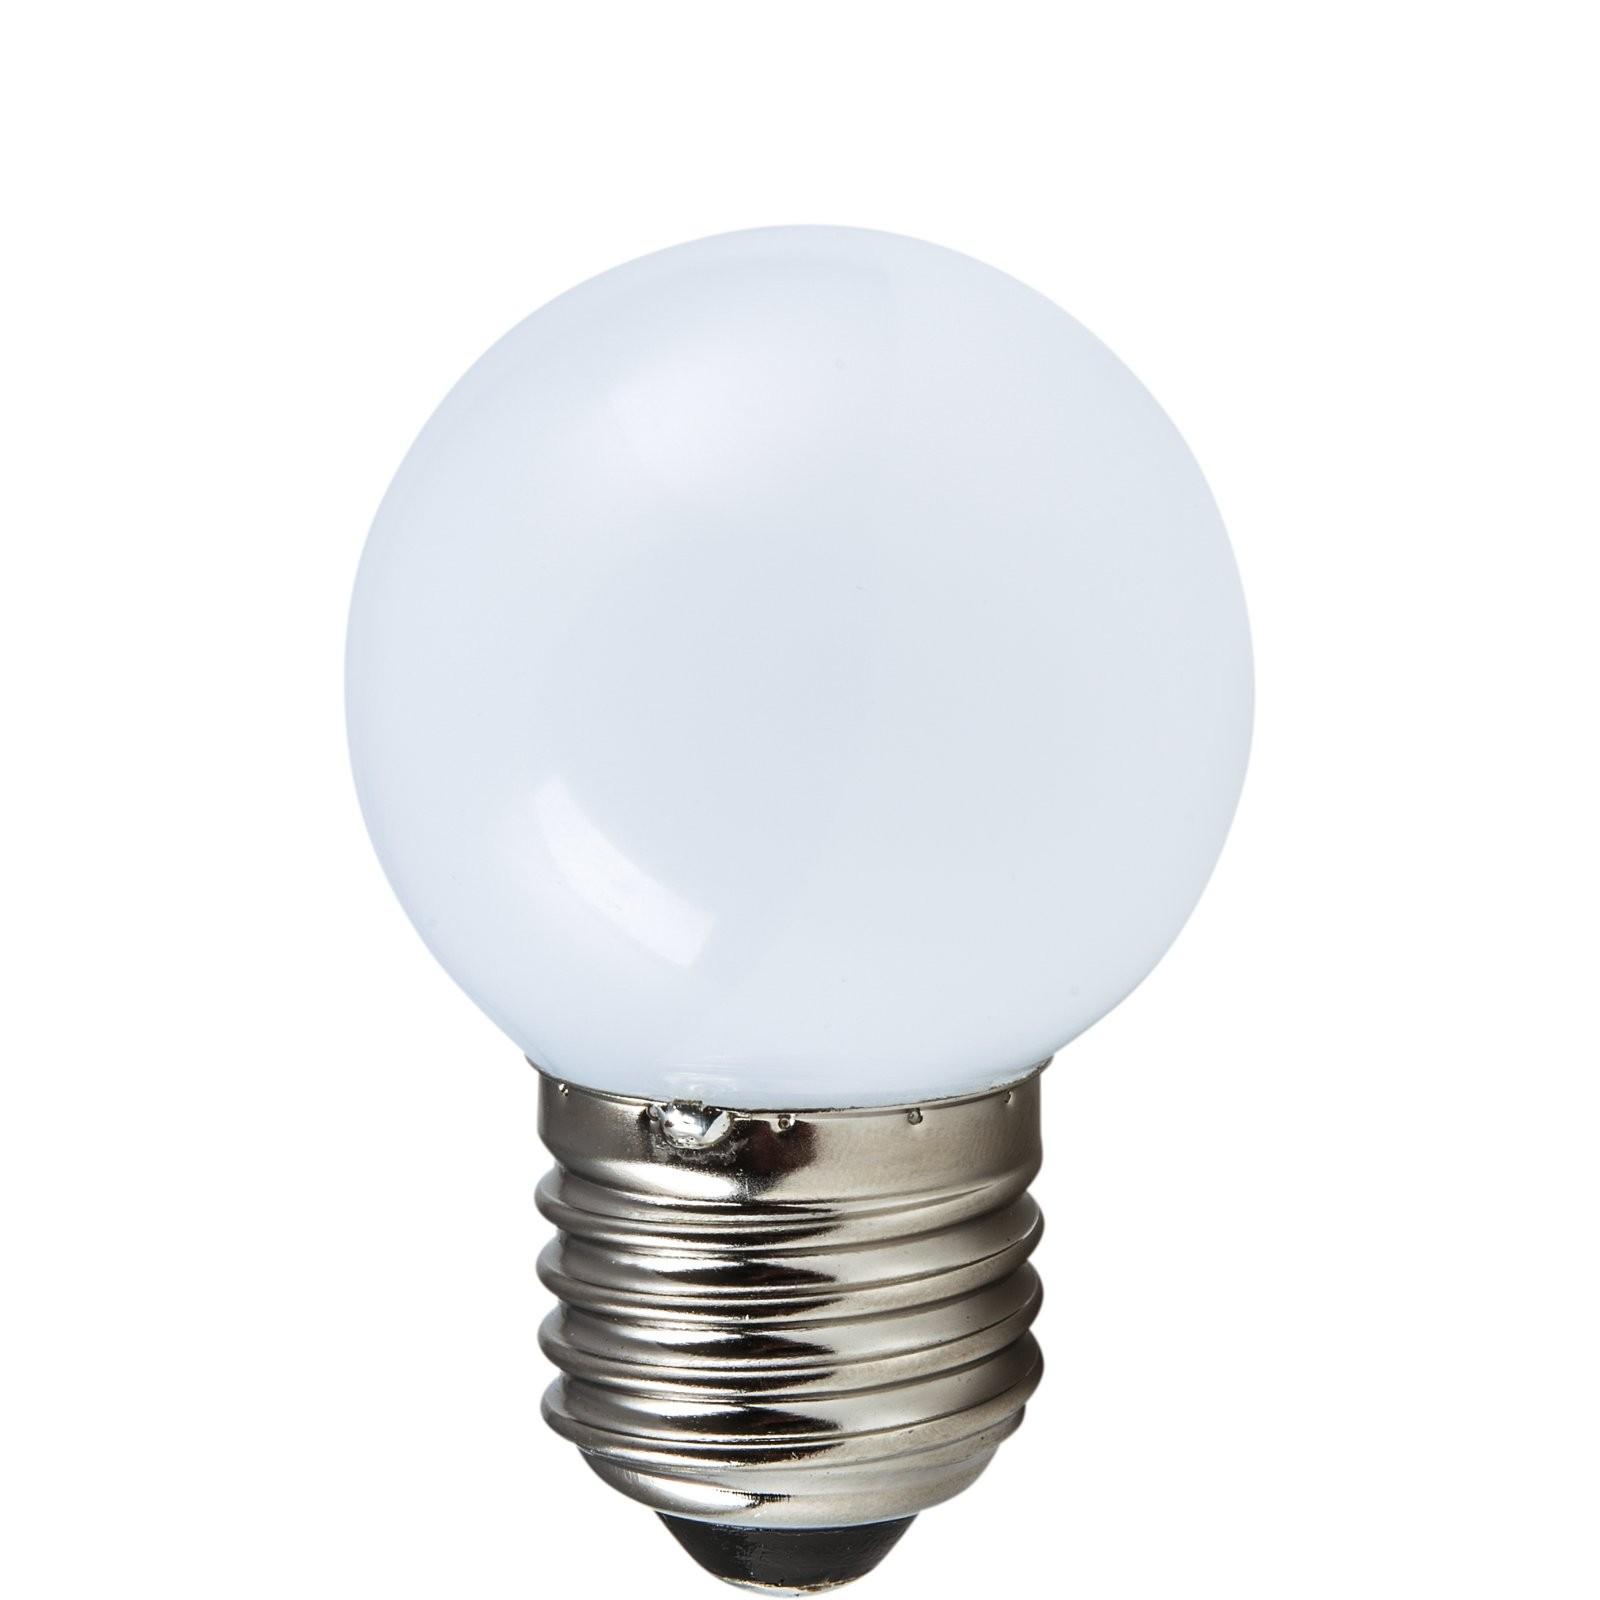 1_LED,Leuchtmittel,Heitronic,16853,E27,Tropfenform,warmweiss,96lm,16853,4002940168532